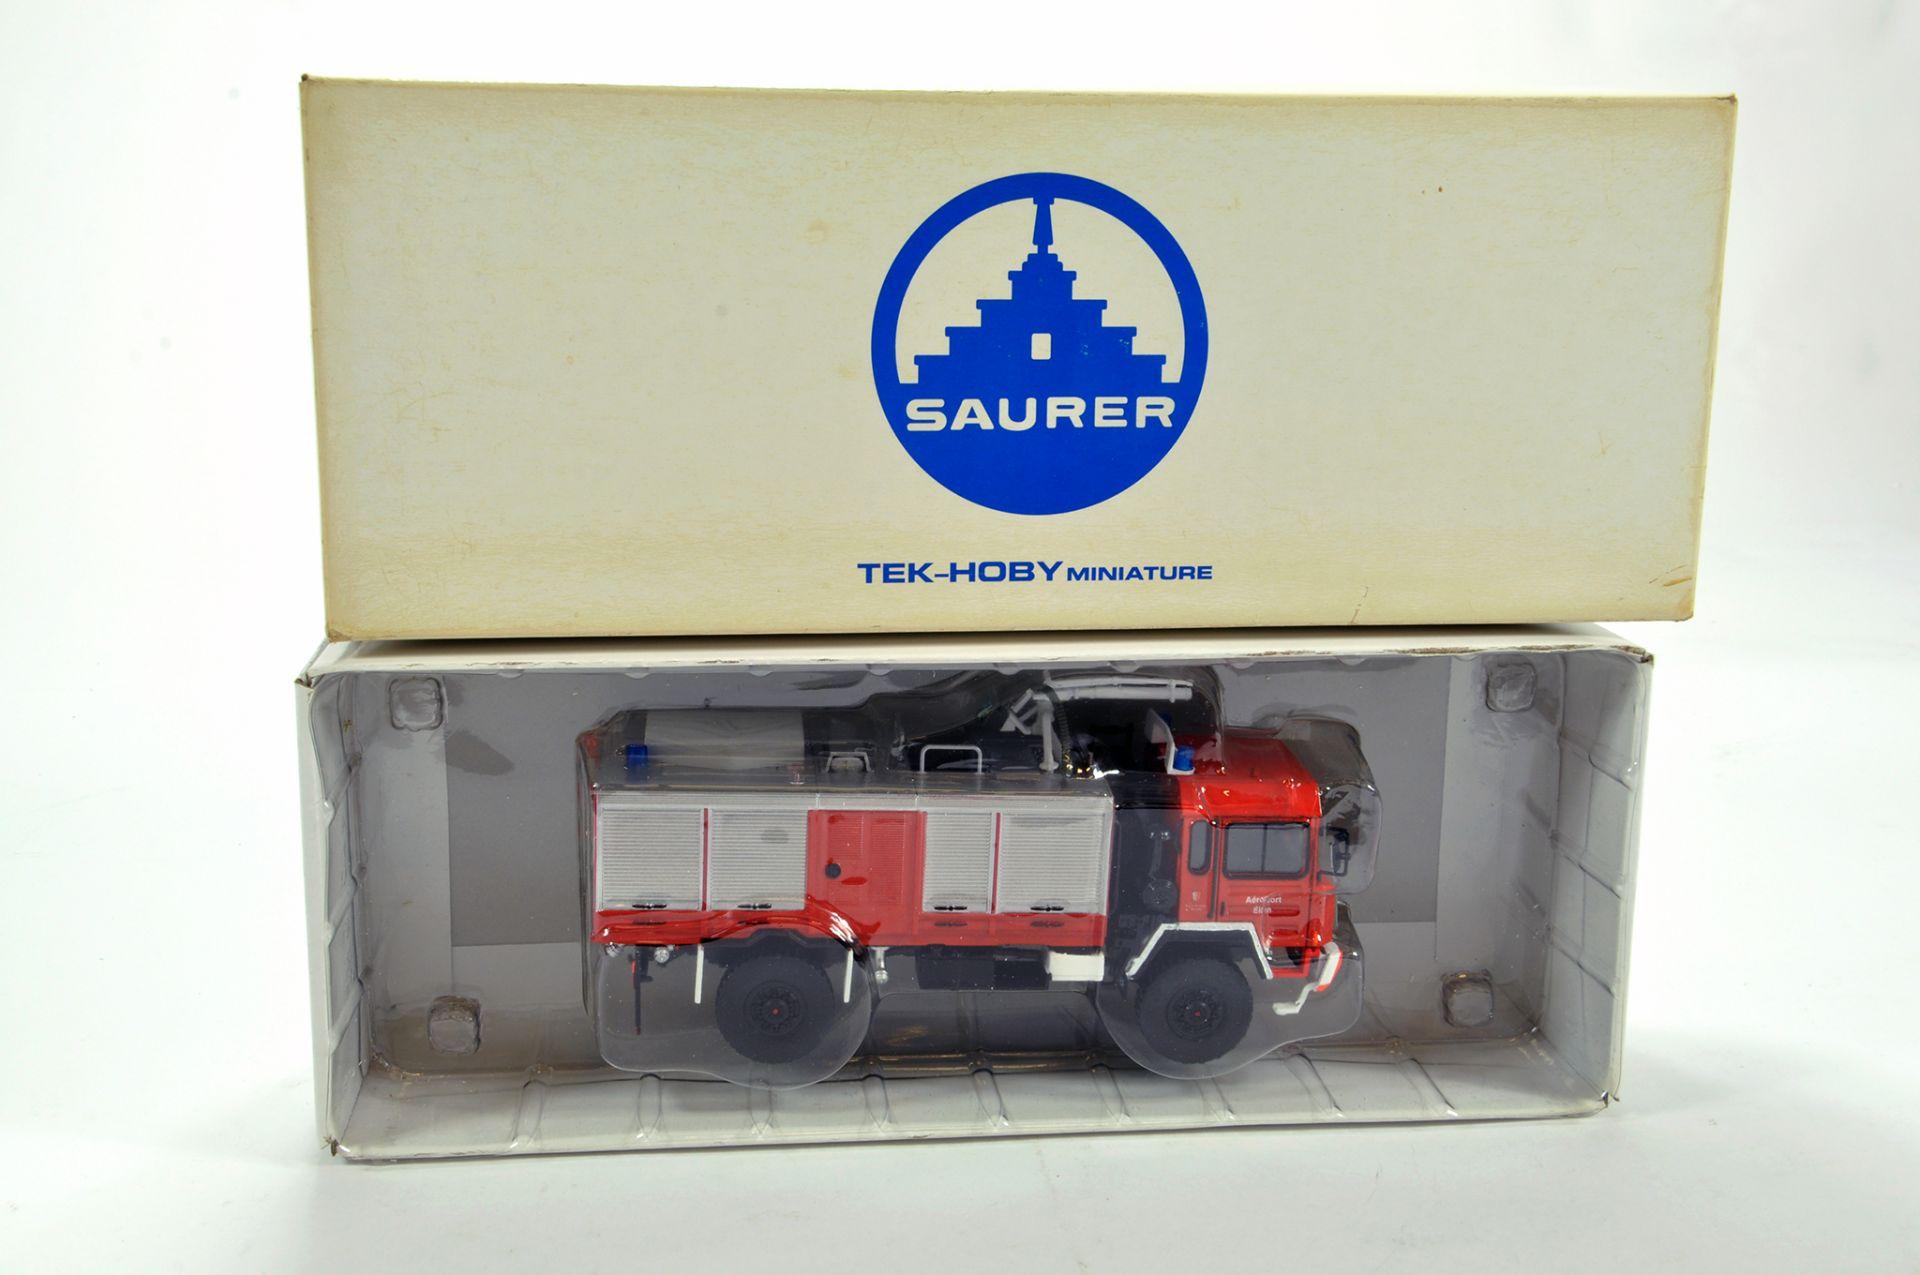 Lot 1080 - Tek Hobby (Swiss) Resin 1/50 Saurer Military Fire Appliance Truck. Scarce Issue is NM in Box.